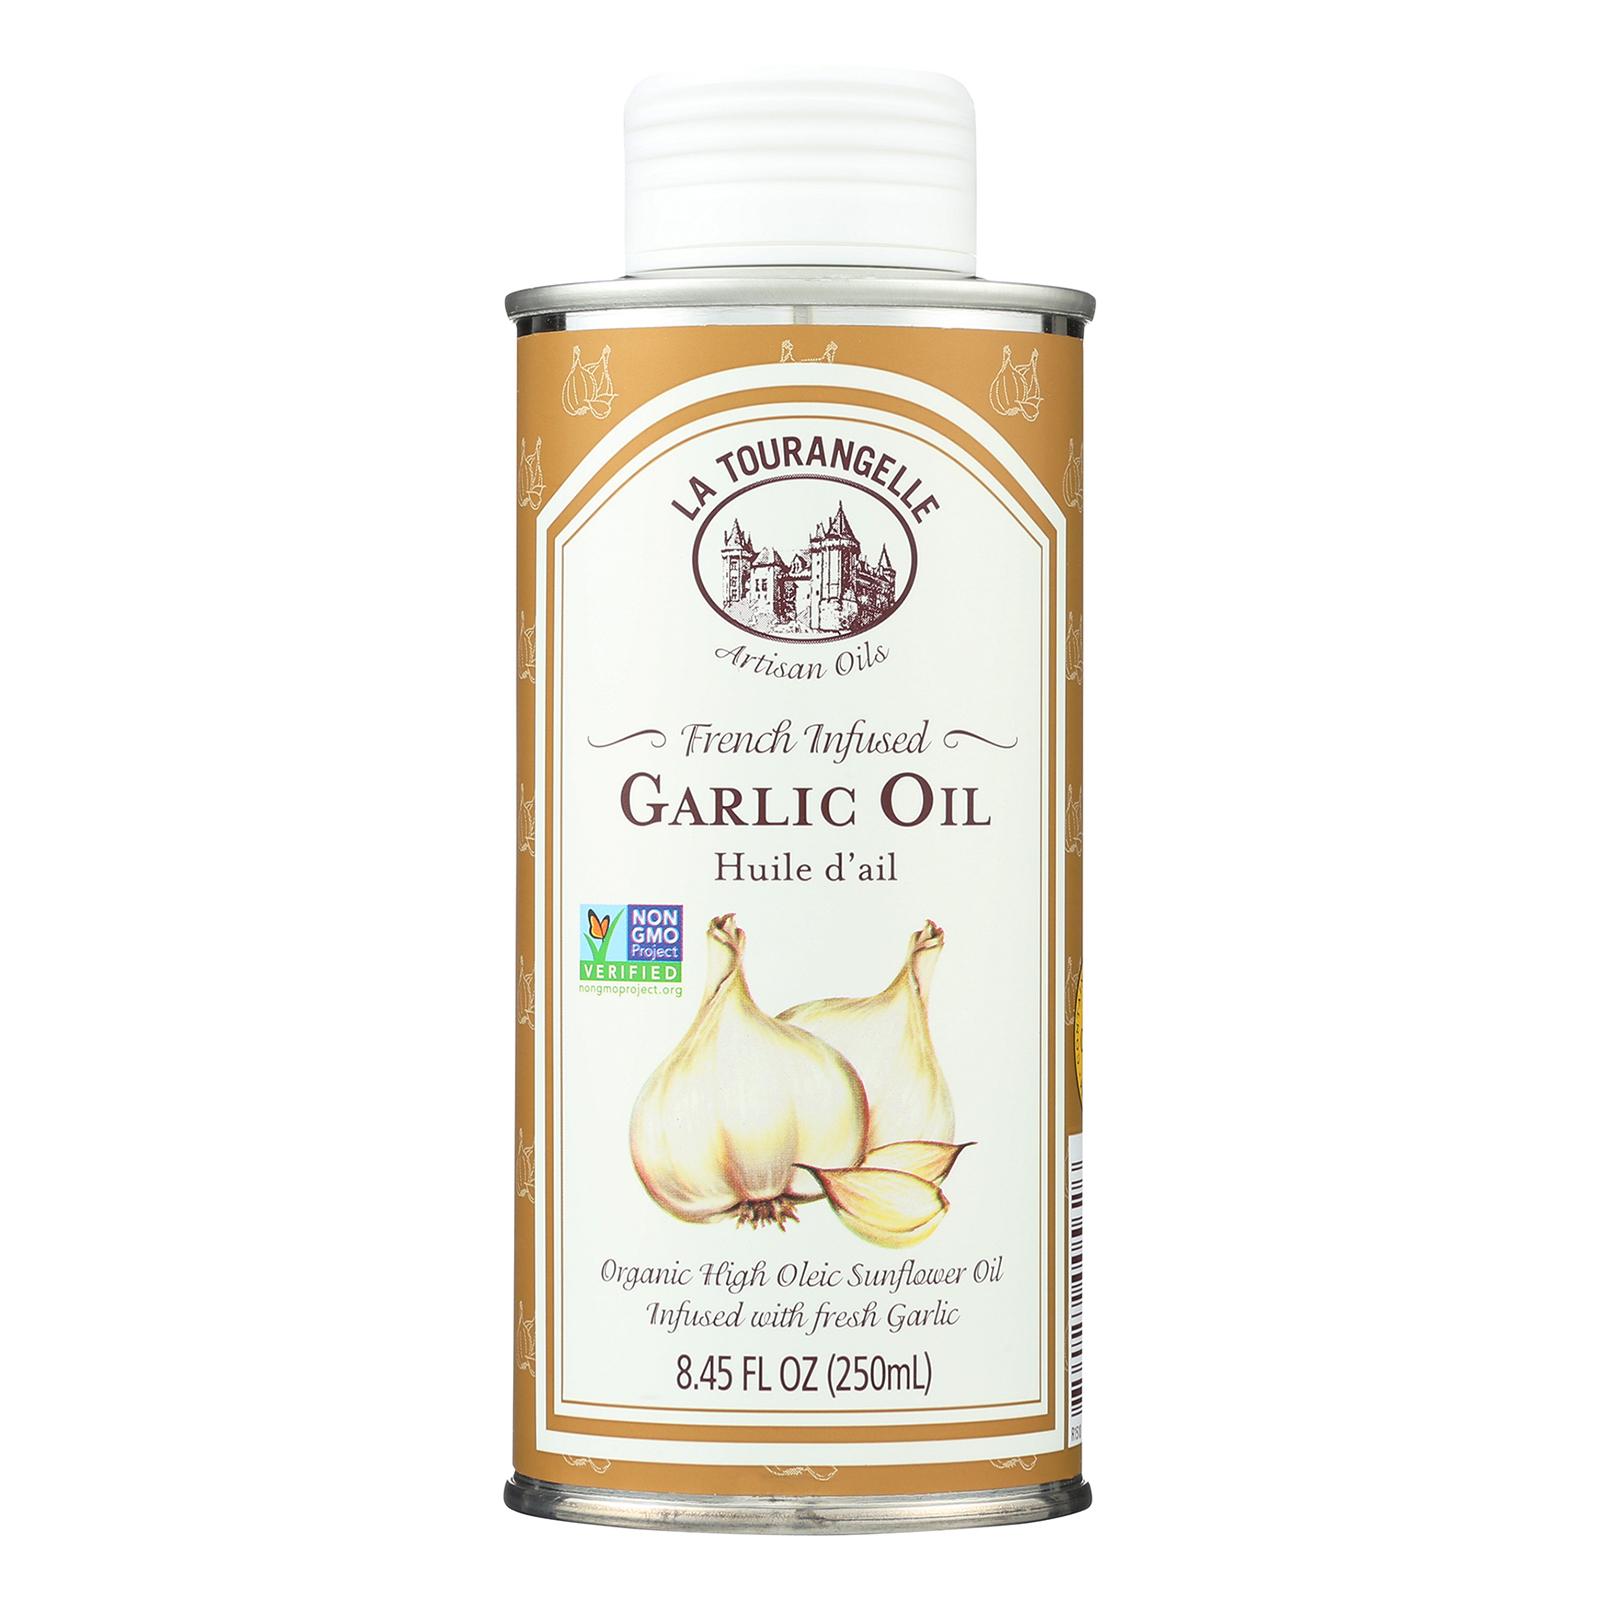 La Tourangelle French Infused Garlic Oil - Case of 6 - 8.45 Fl oz.